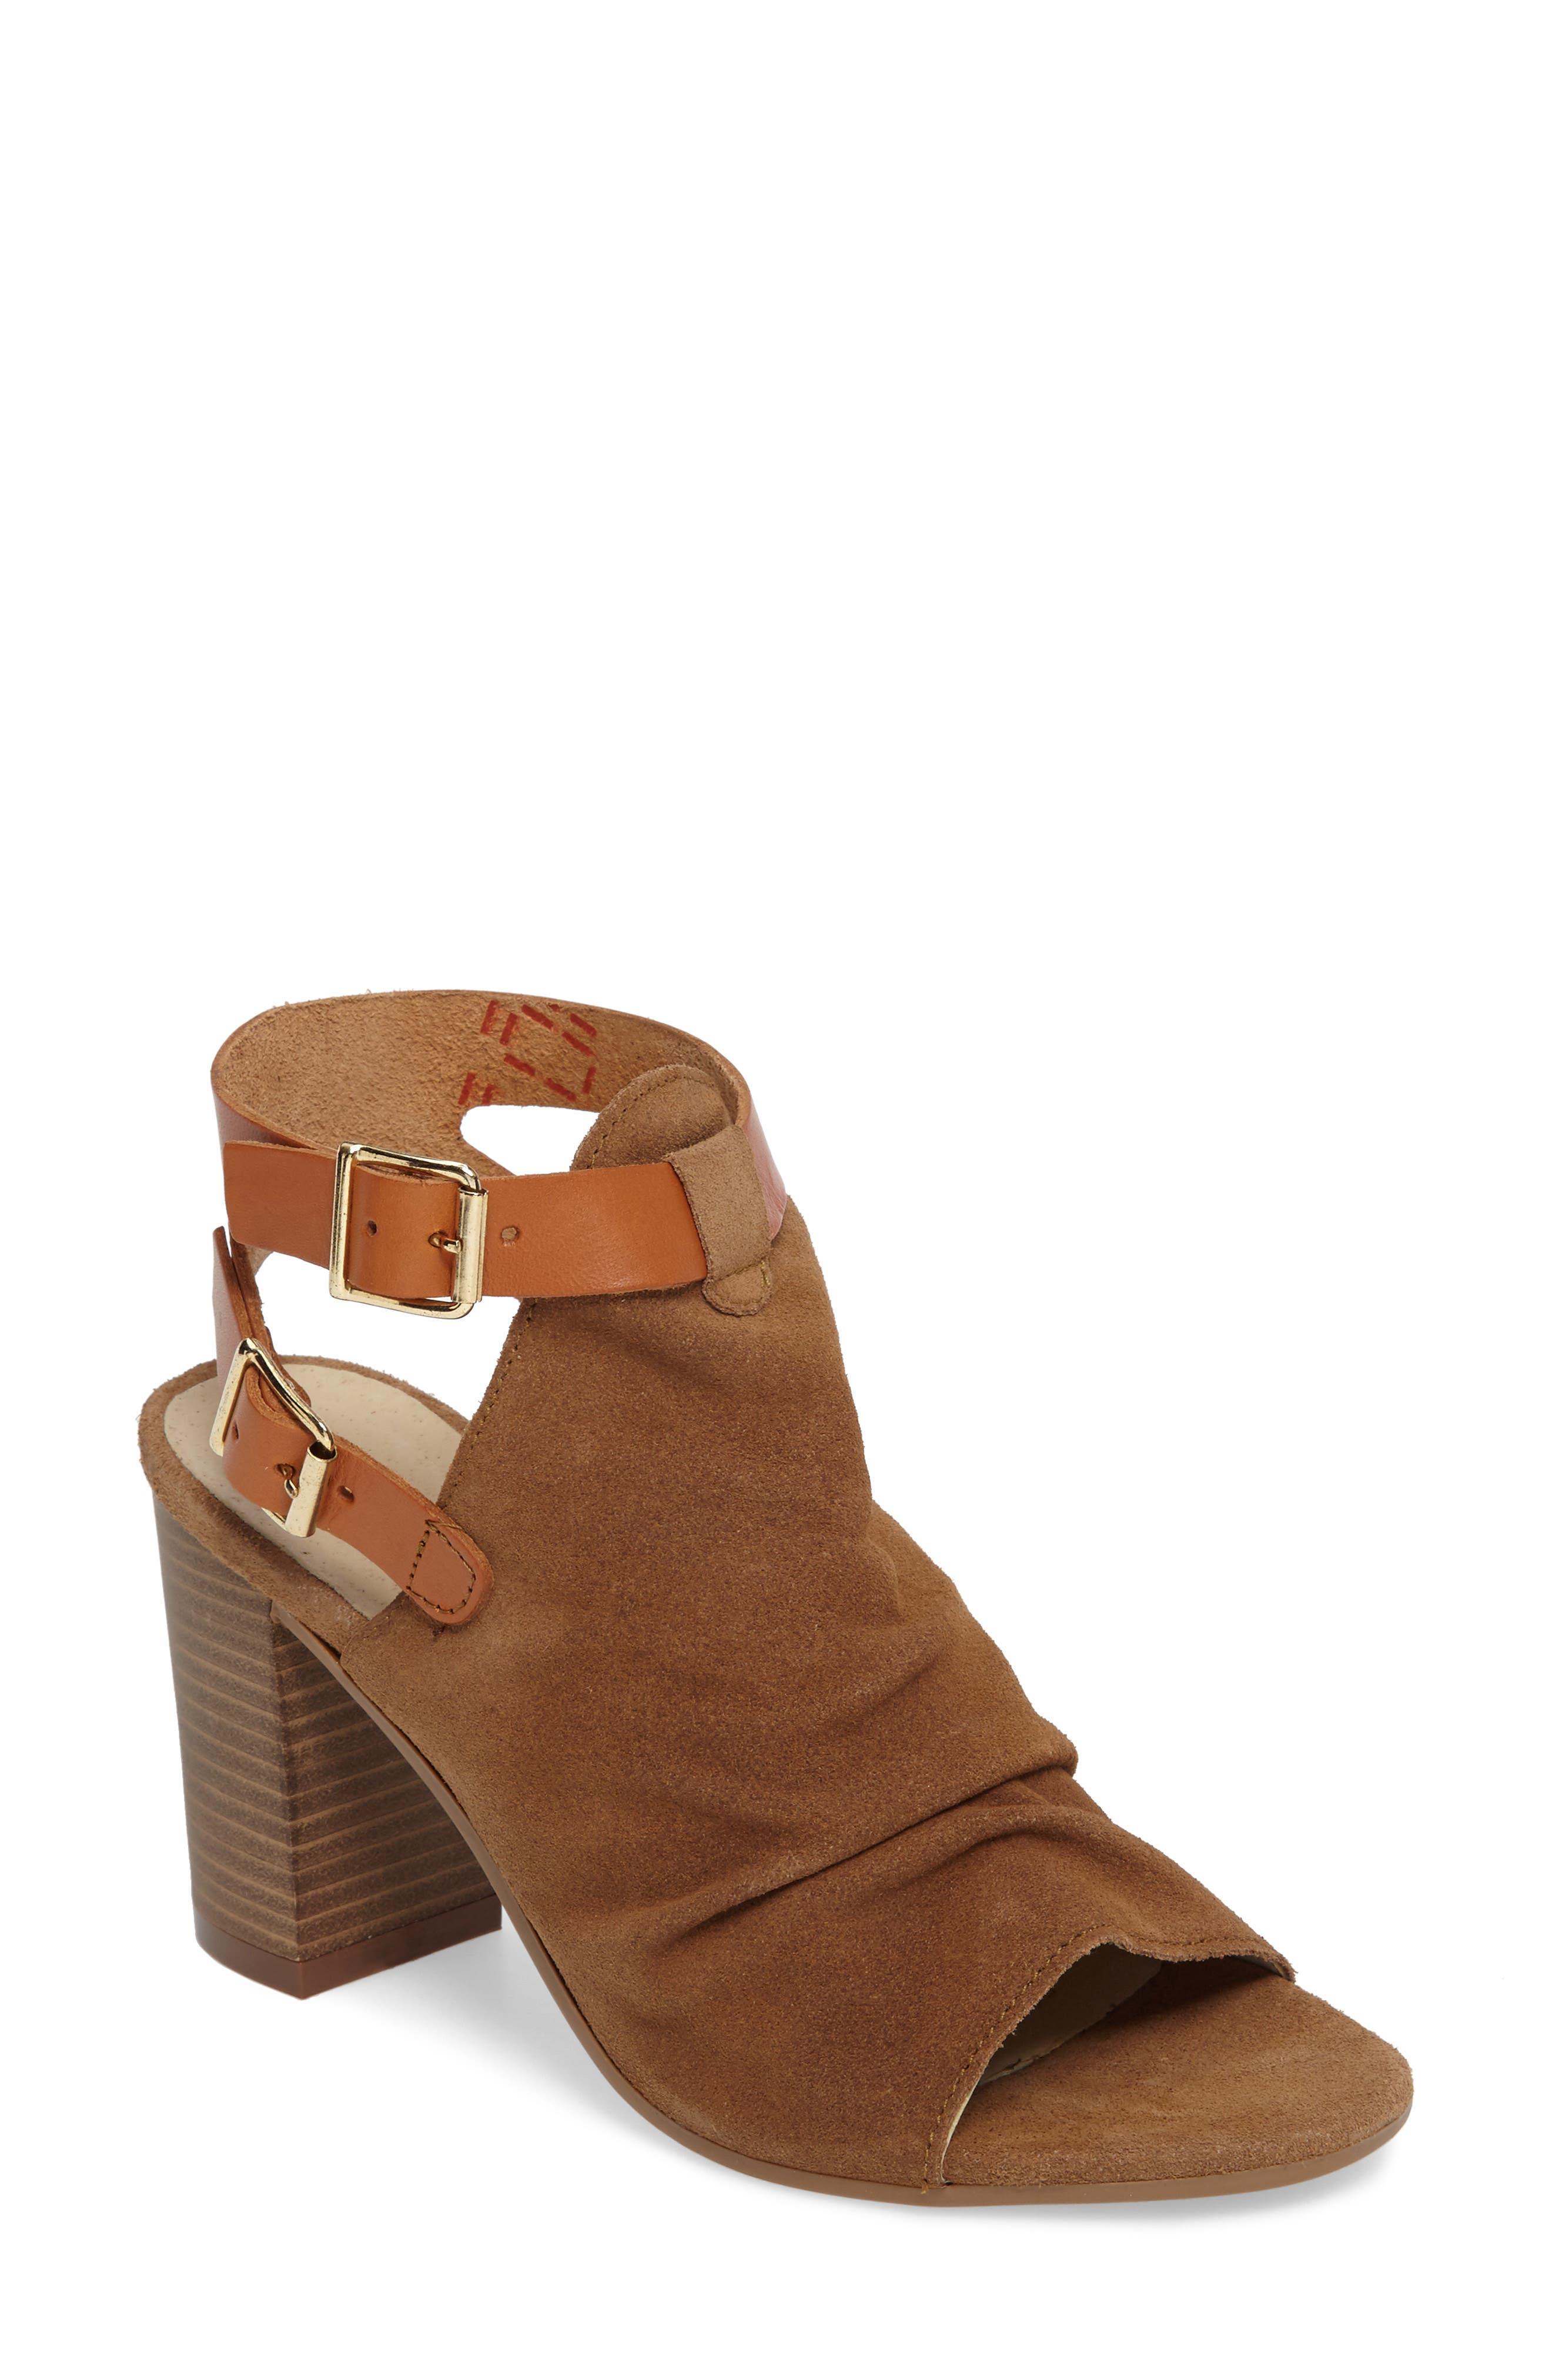 Alternate Image 1 Selected - Bos. & Co. Ivy Block Heel Sandal (Women)